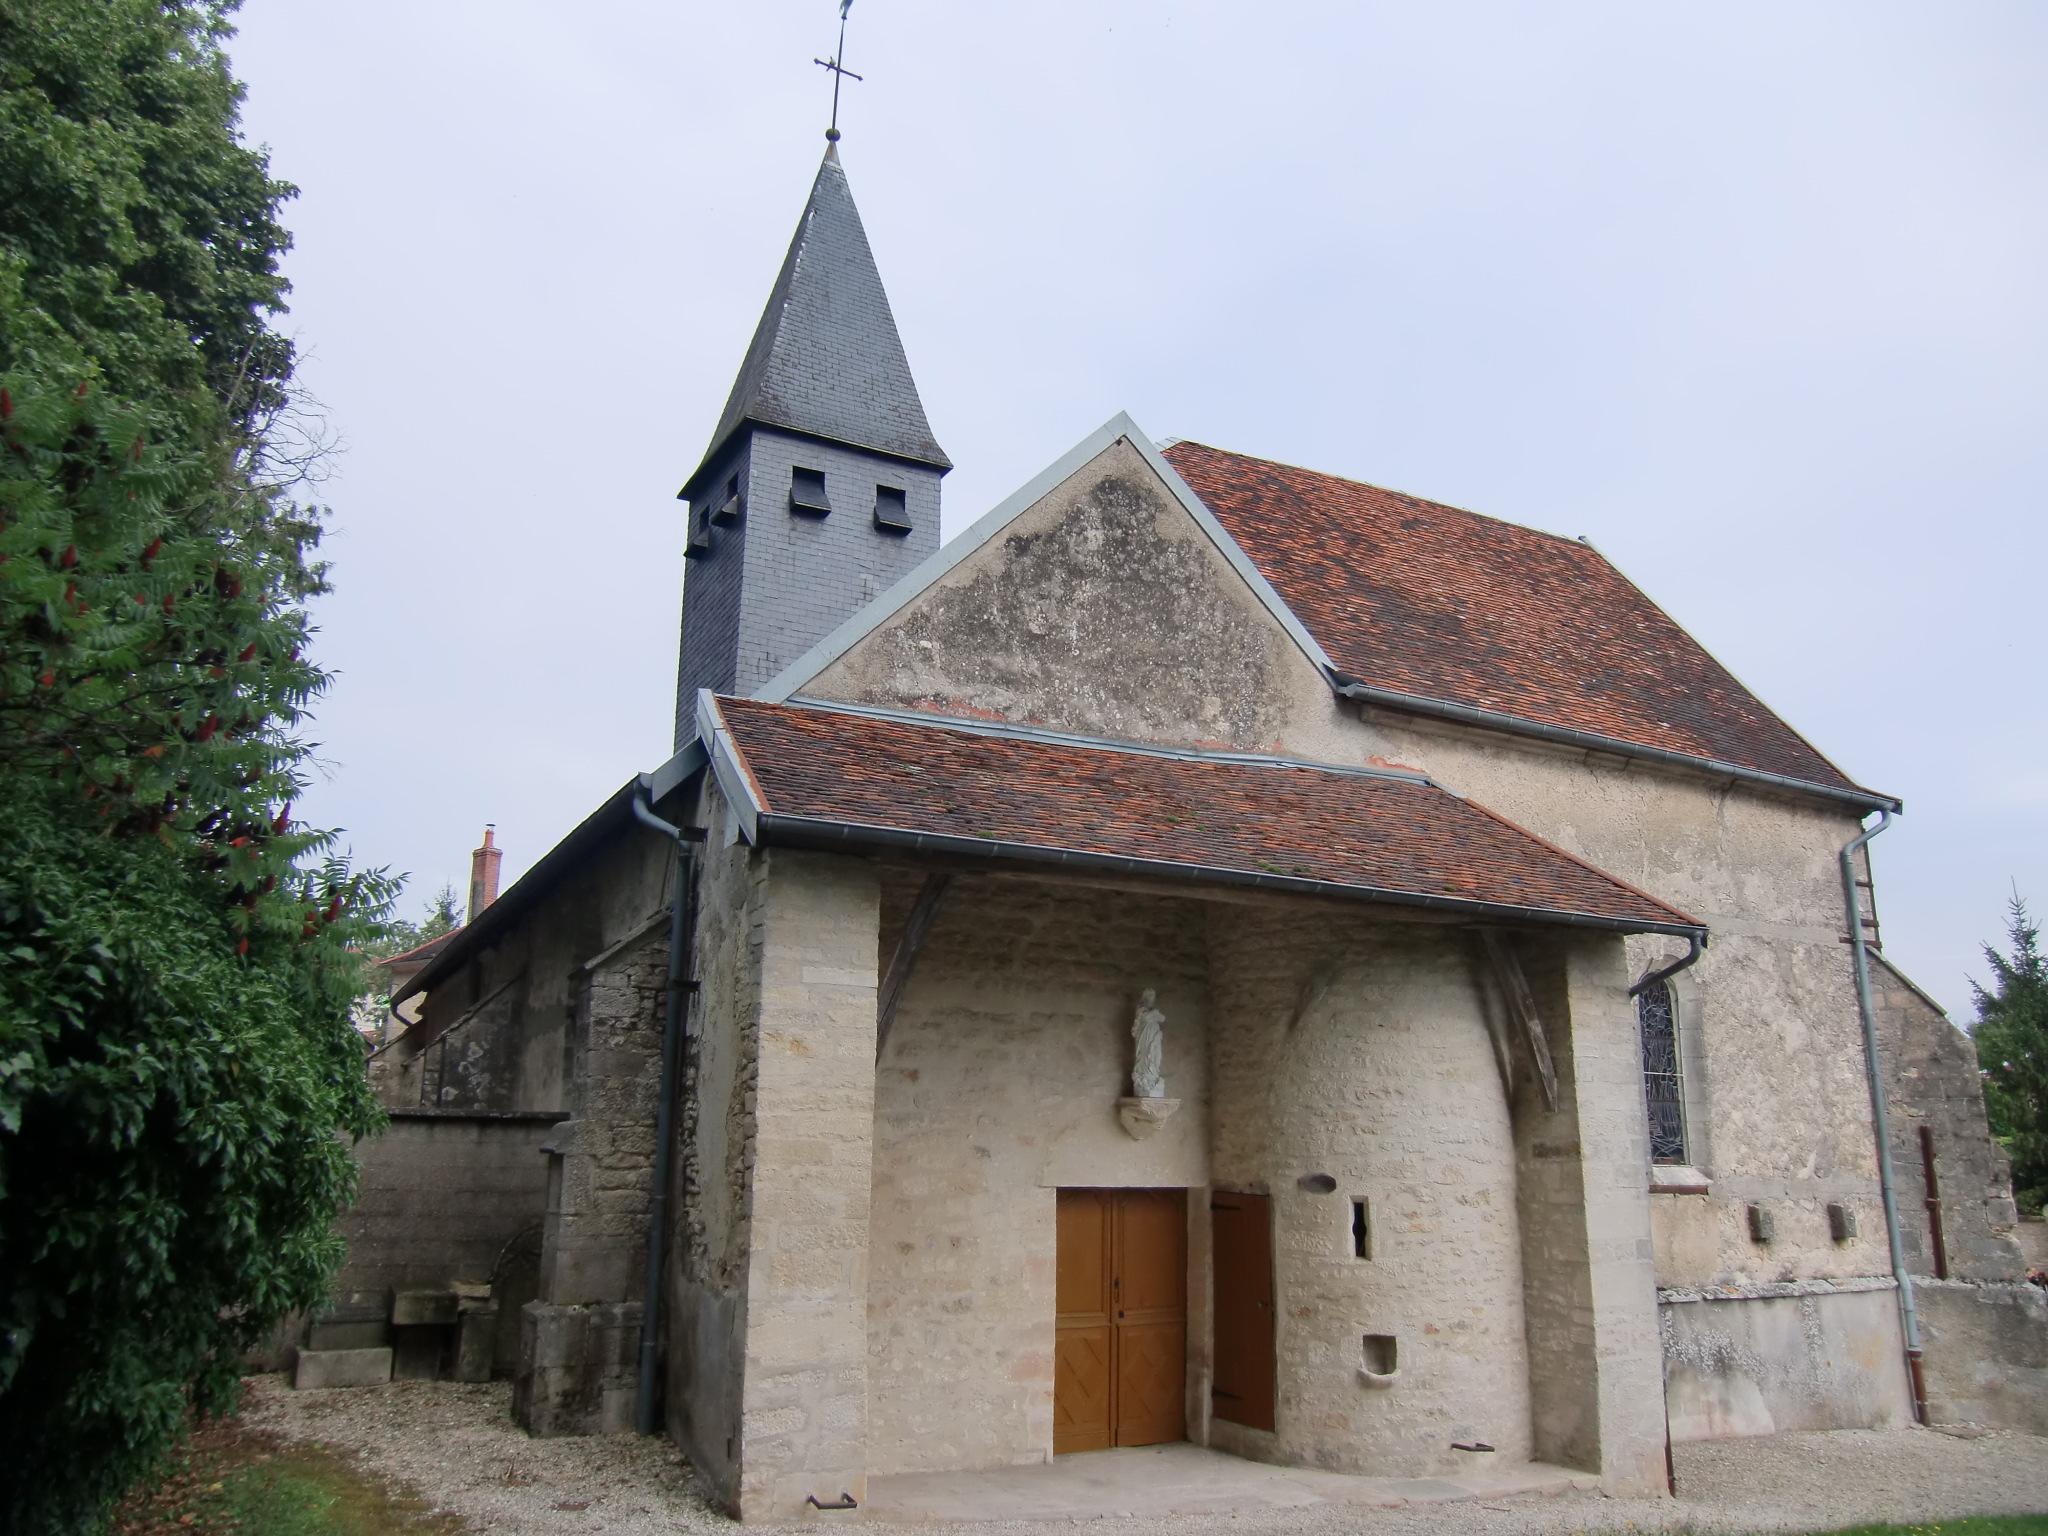 Bossancourt